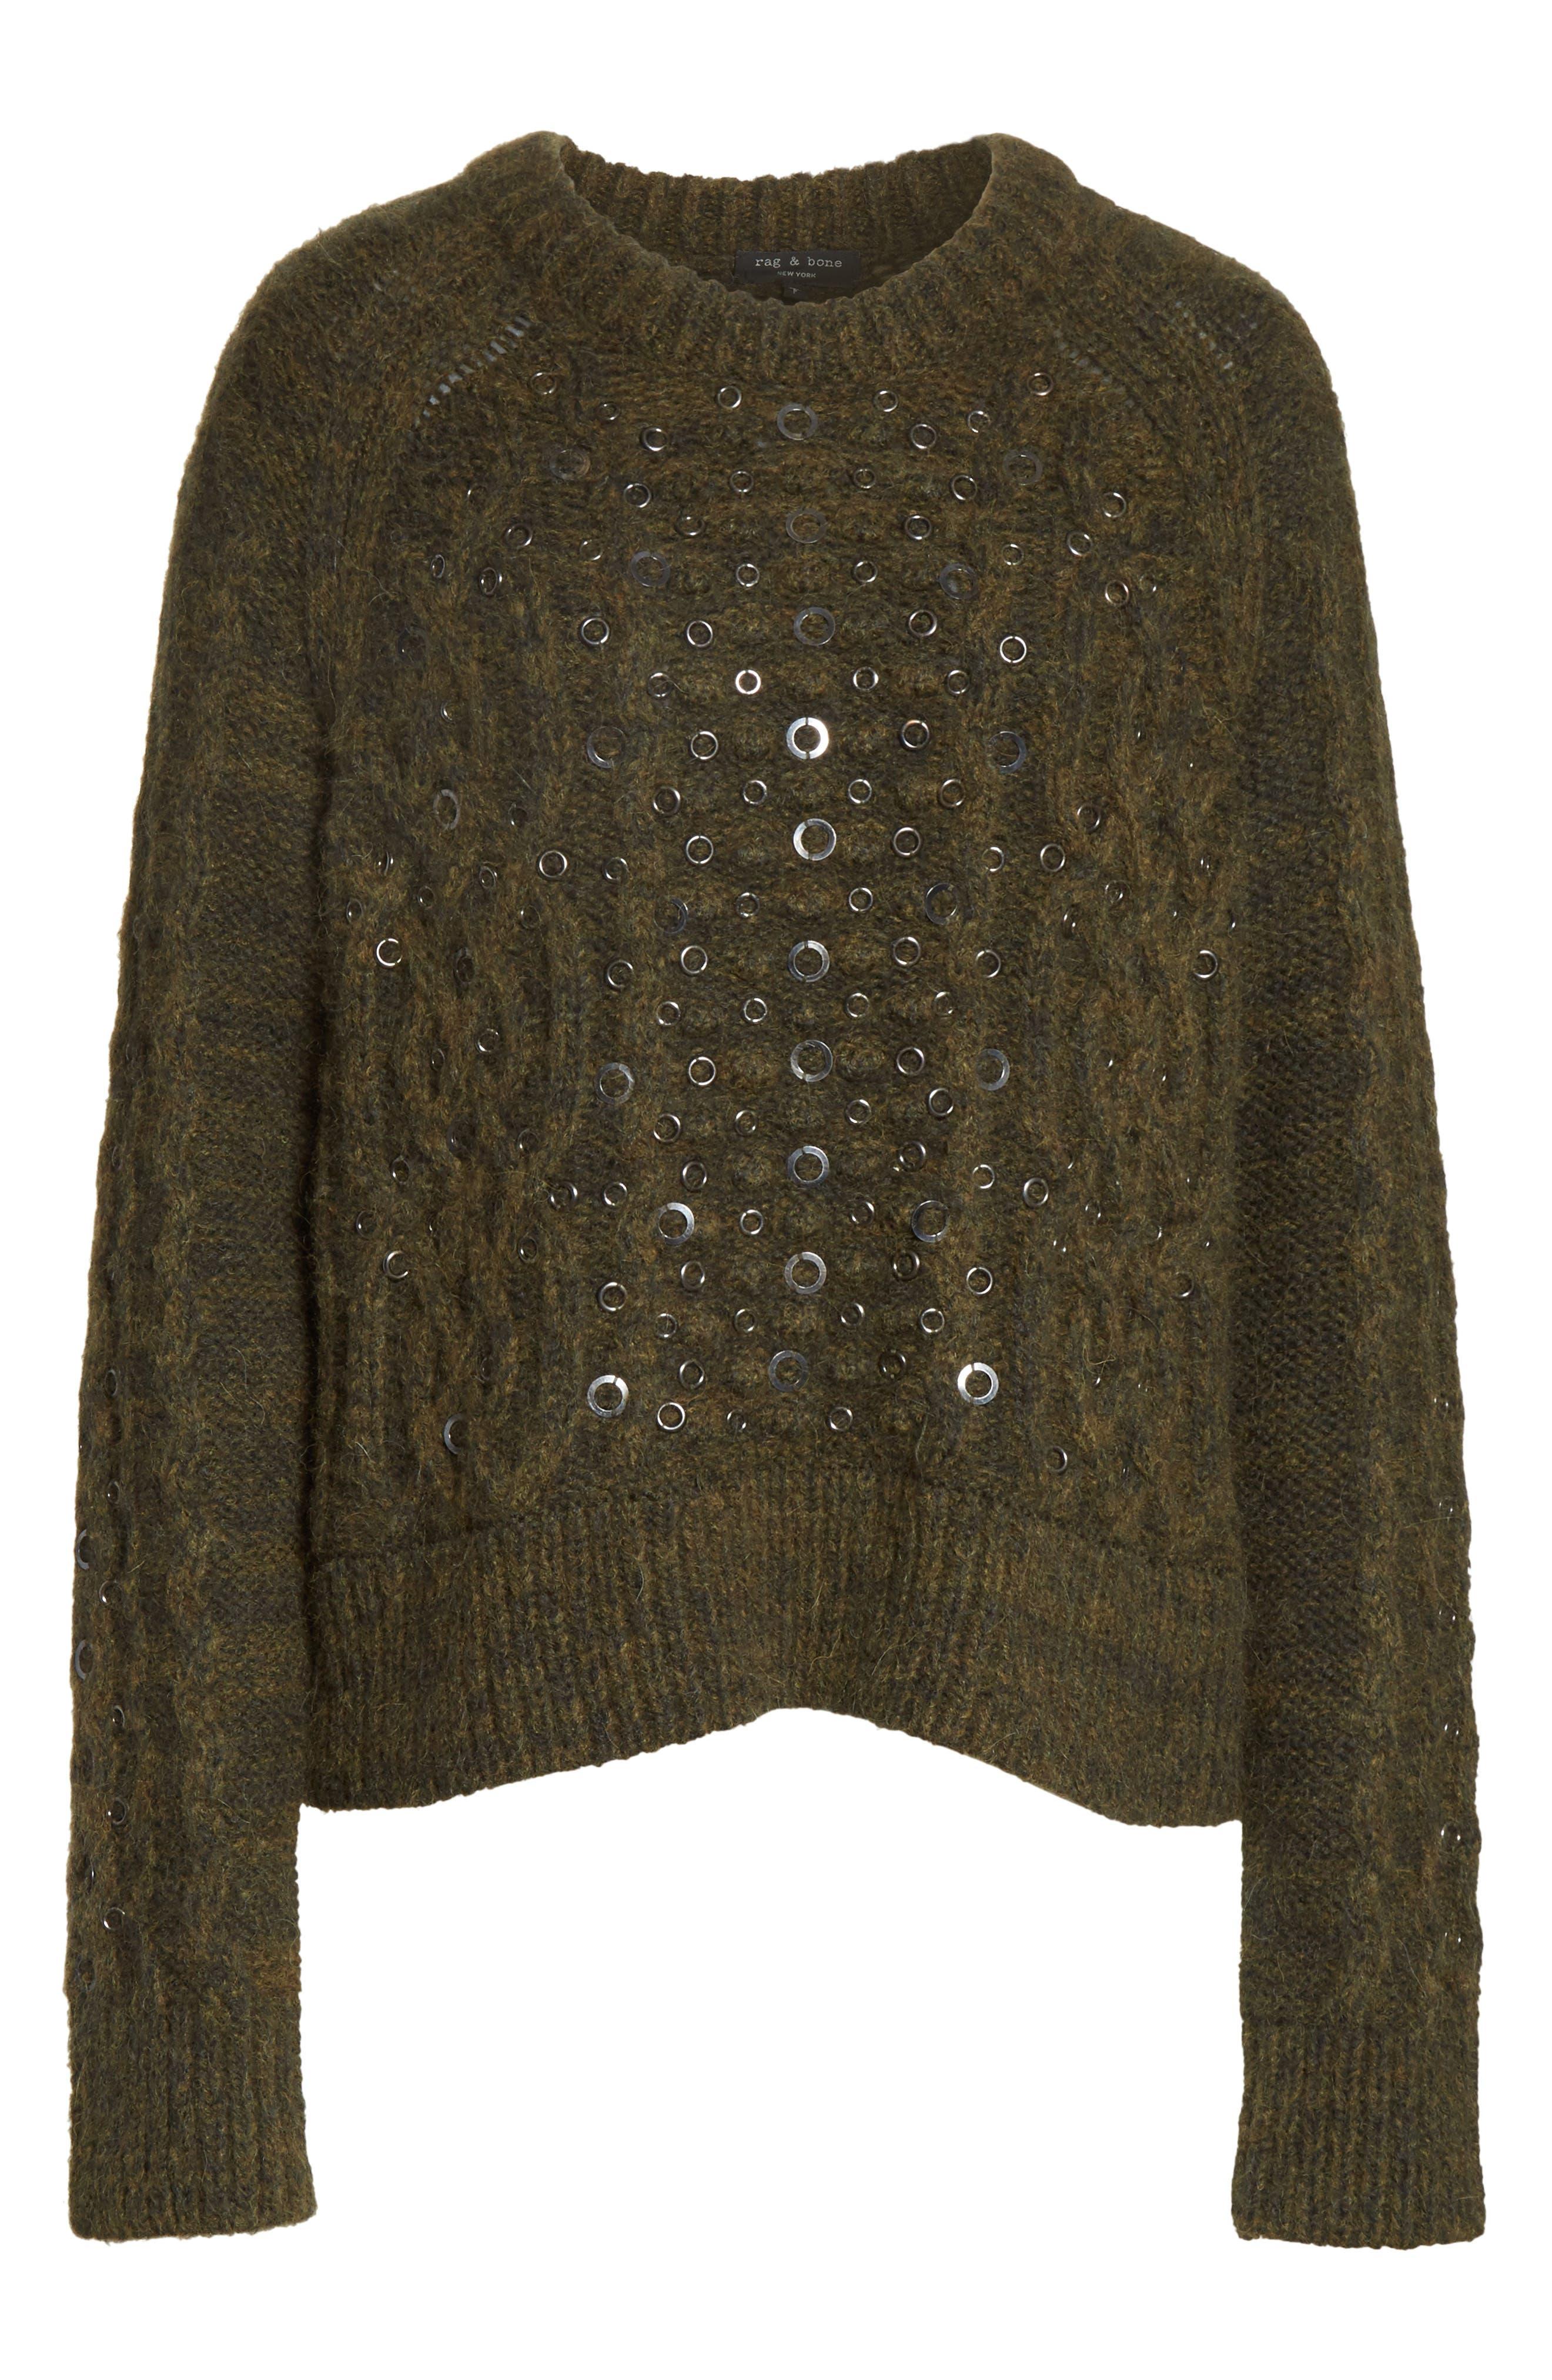 Jemima Wool & Alpaca Blend Beaded Sweater,                             Alternate thumbnail 6, color,                             Army